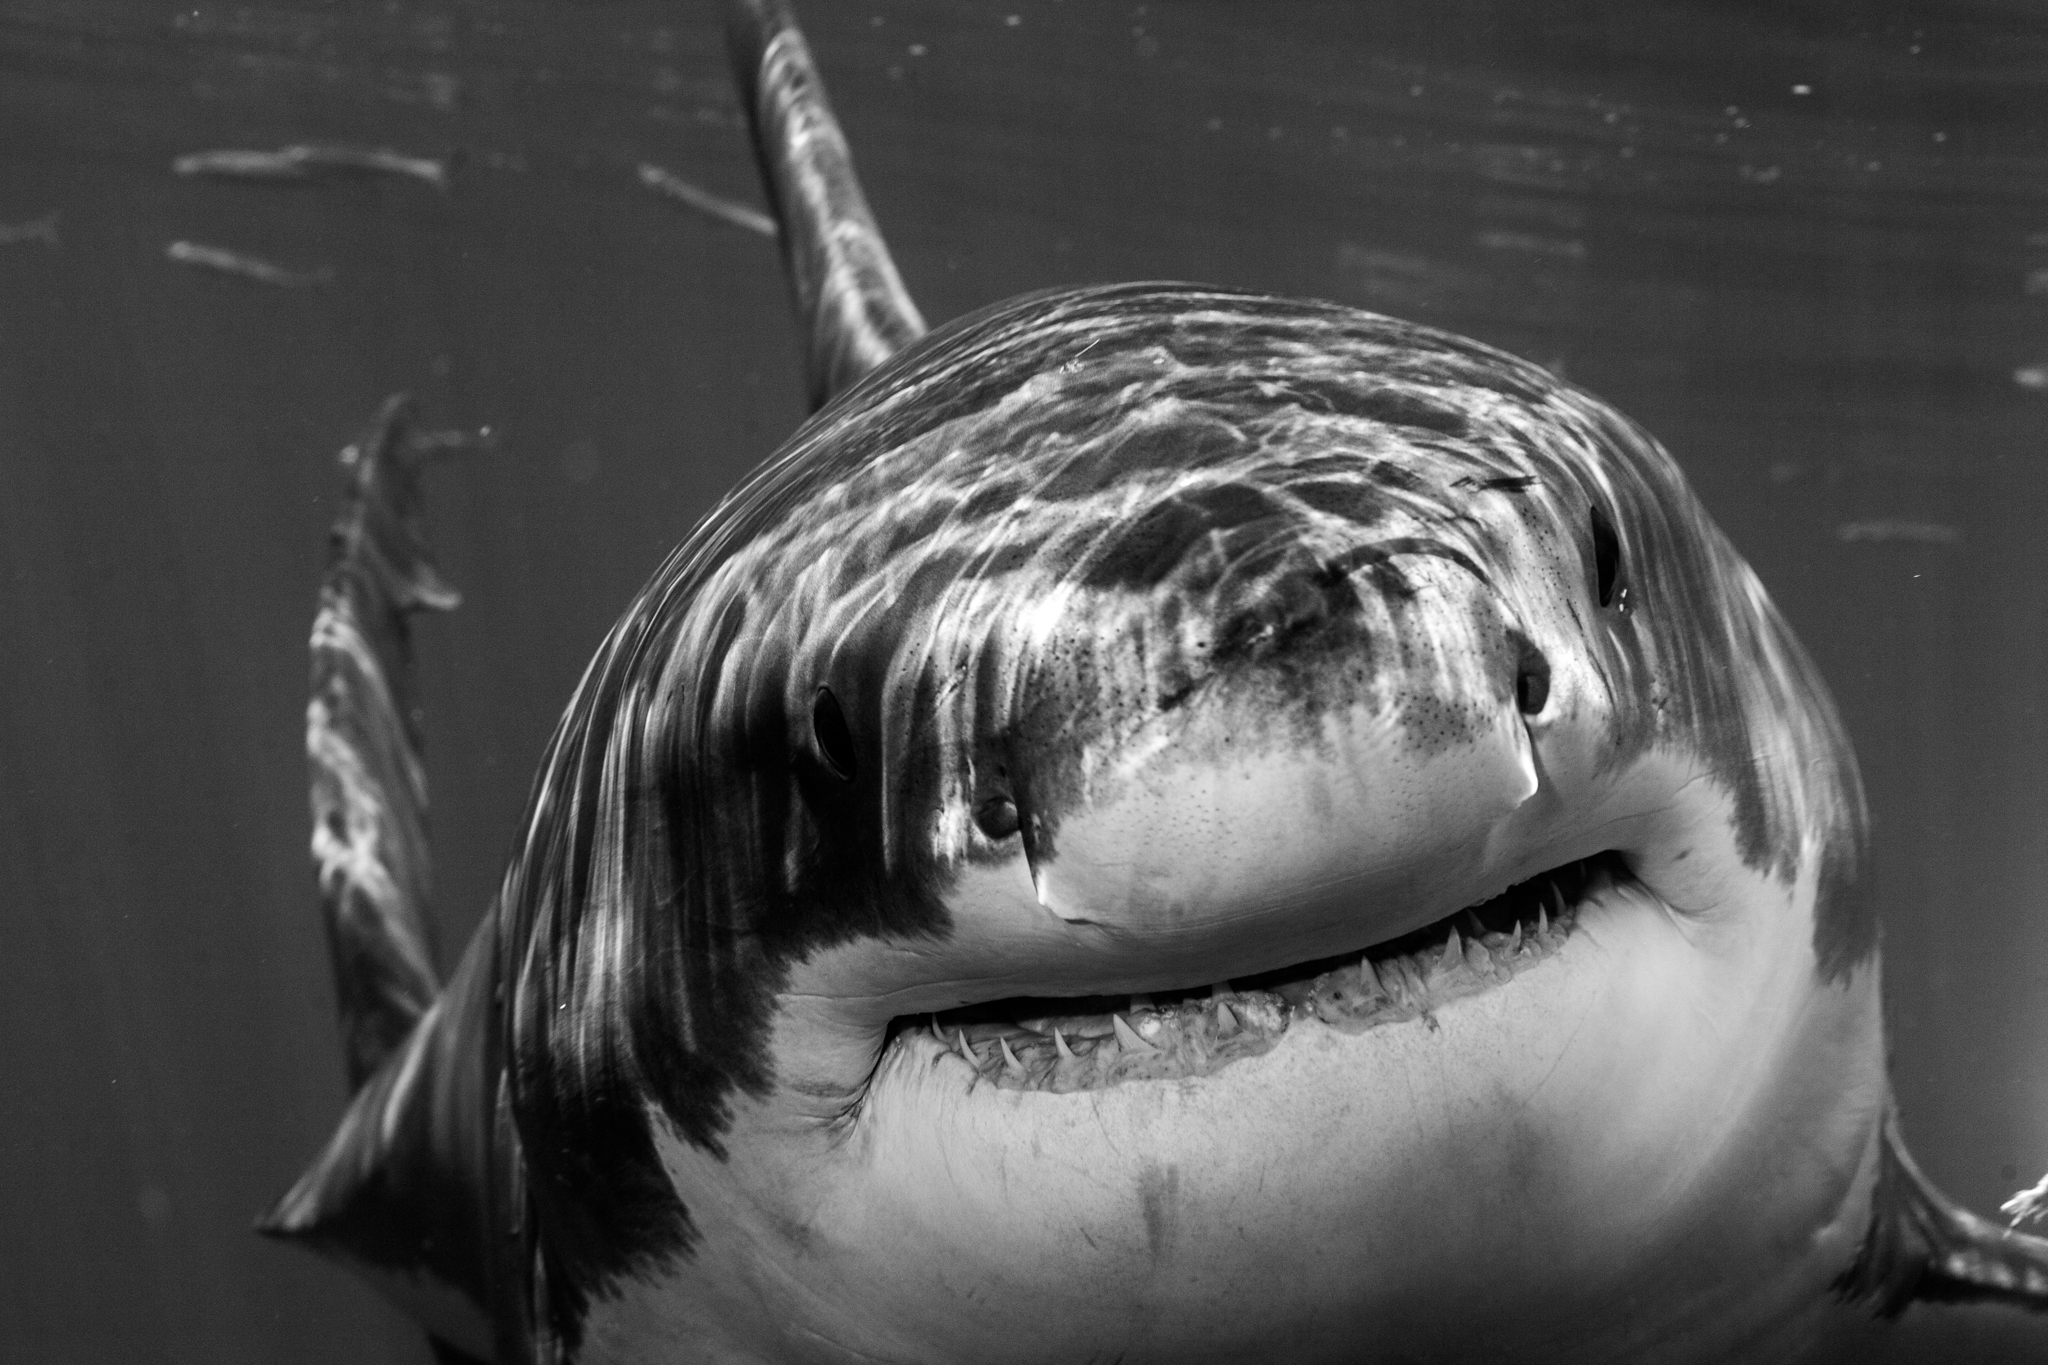 Great_White_Shark_Carcharodon_carcharias12.jpg